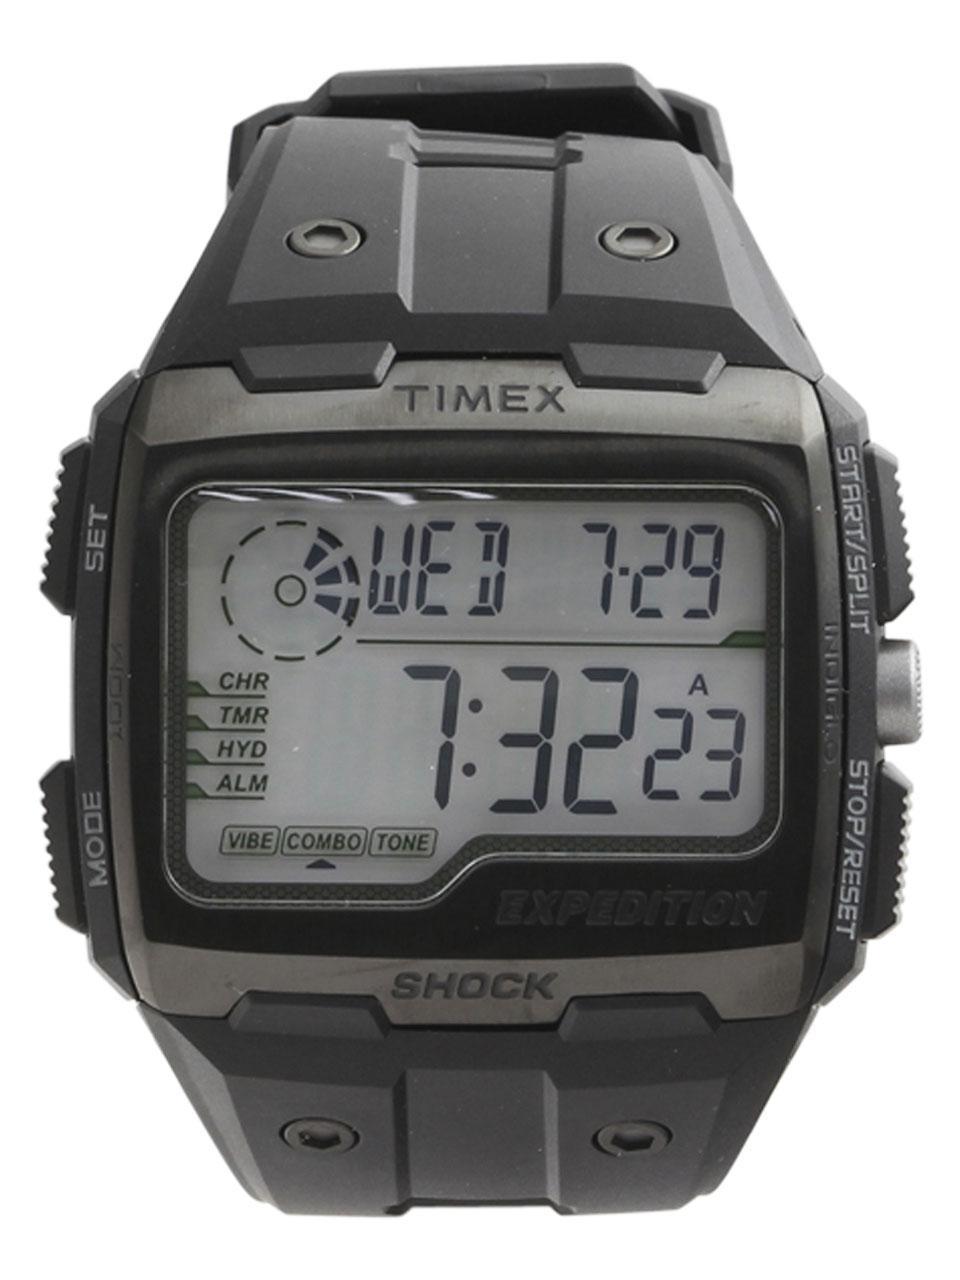 Timex Men s TW4B02500 Expedition Grid Shock Black Digital Watch